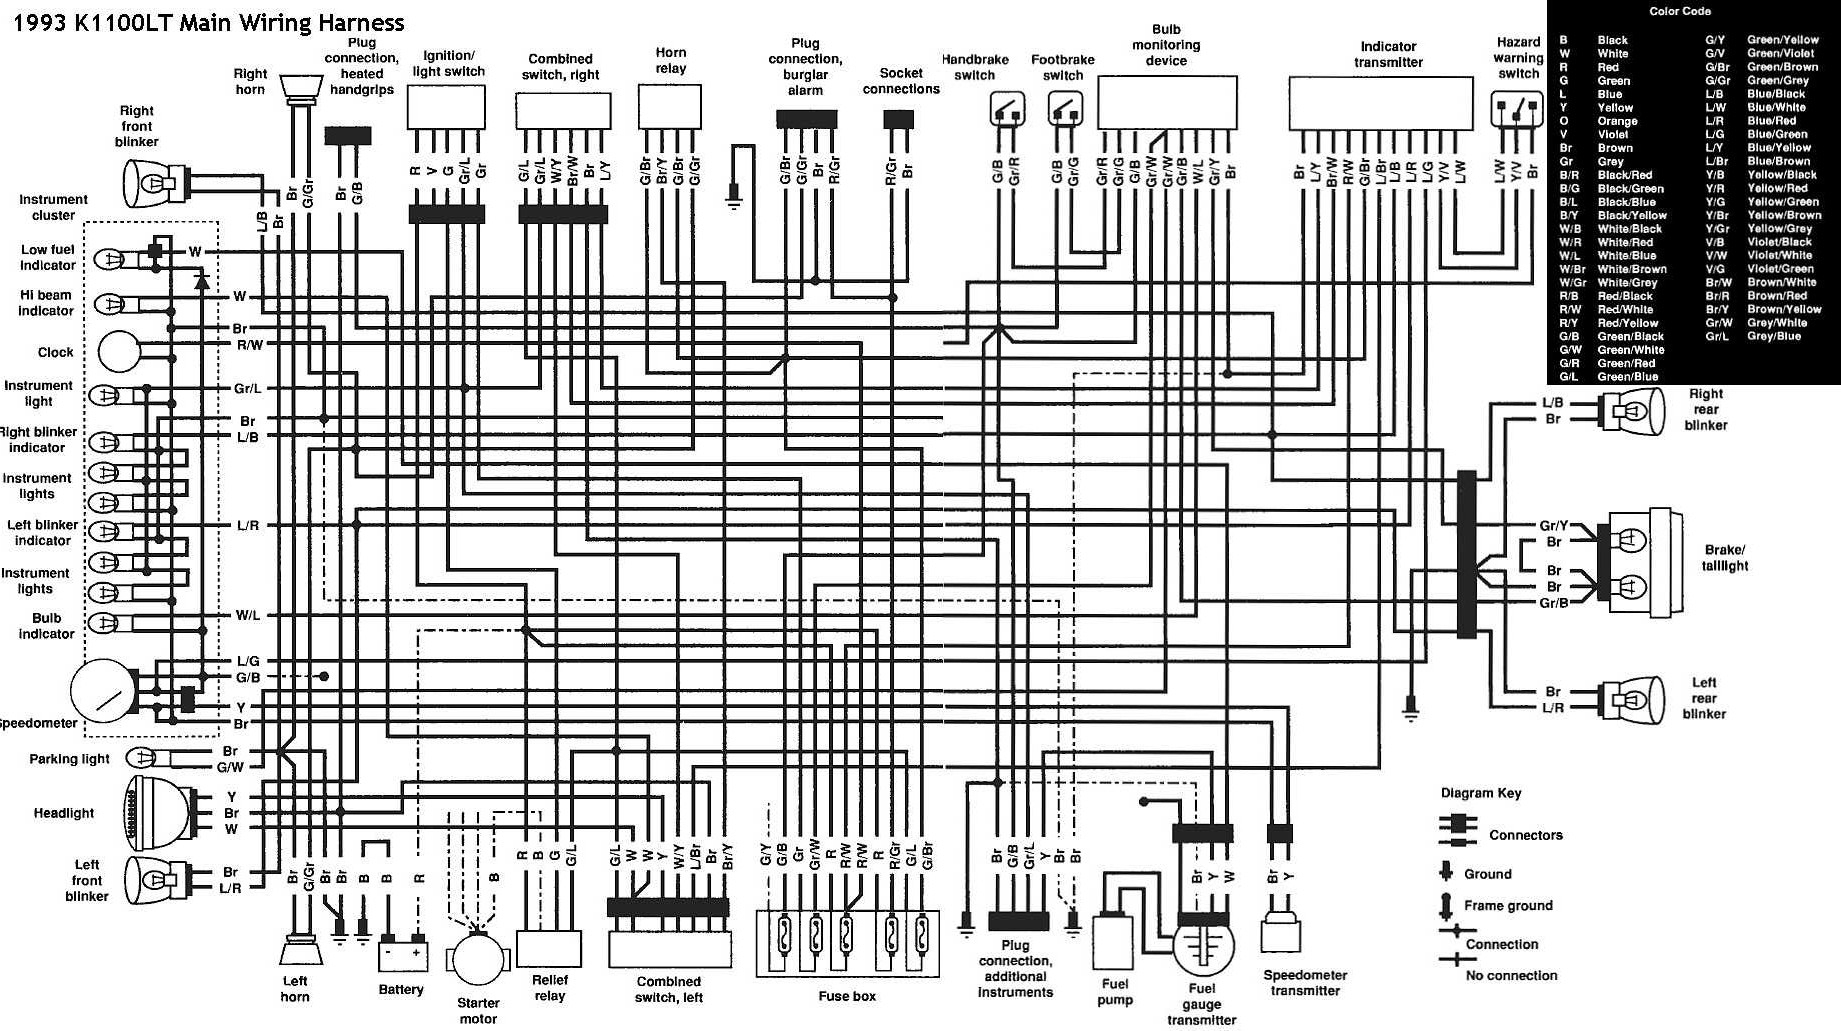 Wiring Diagrams For Bmw - Wiring Diagrams Hubs - Bmw Wiring Diagram